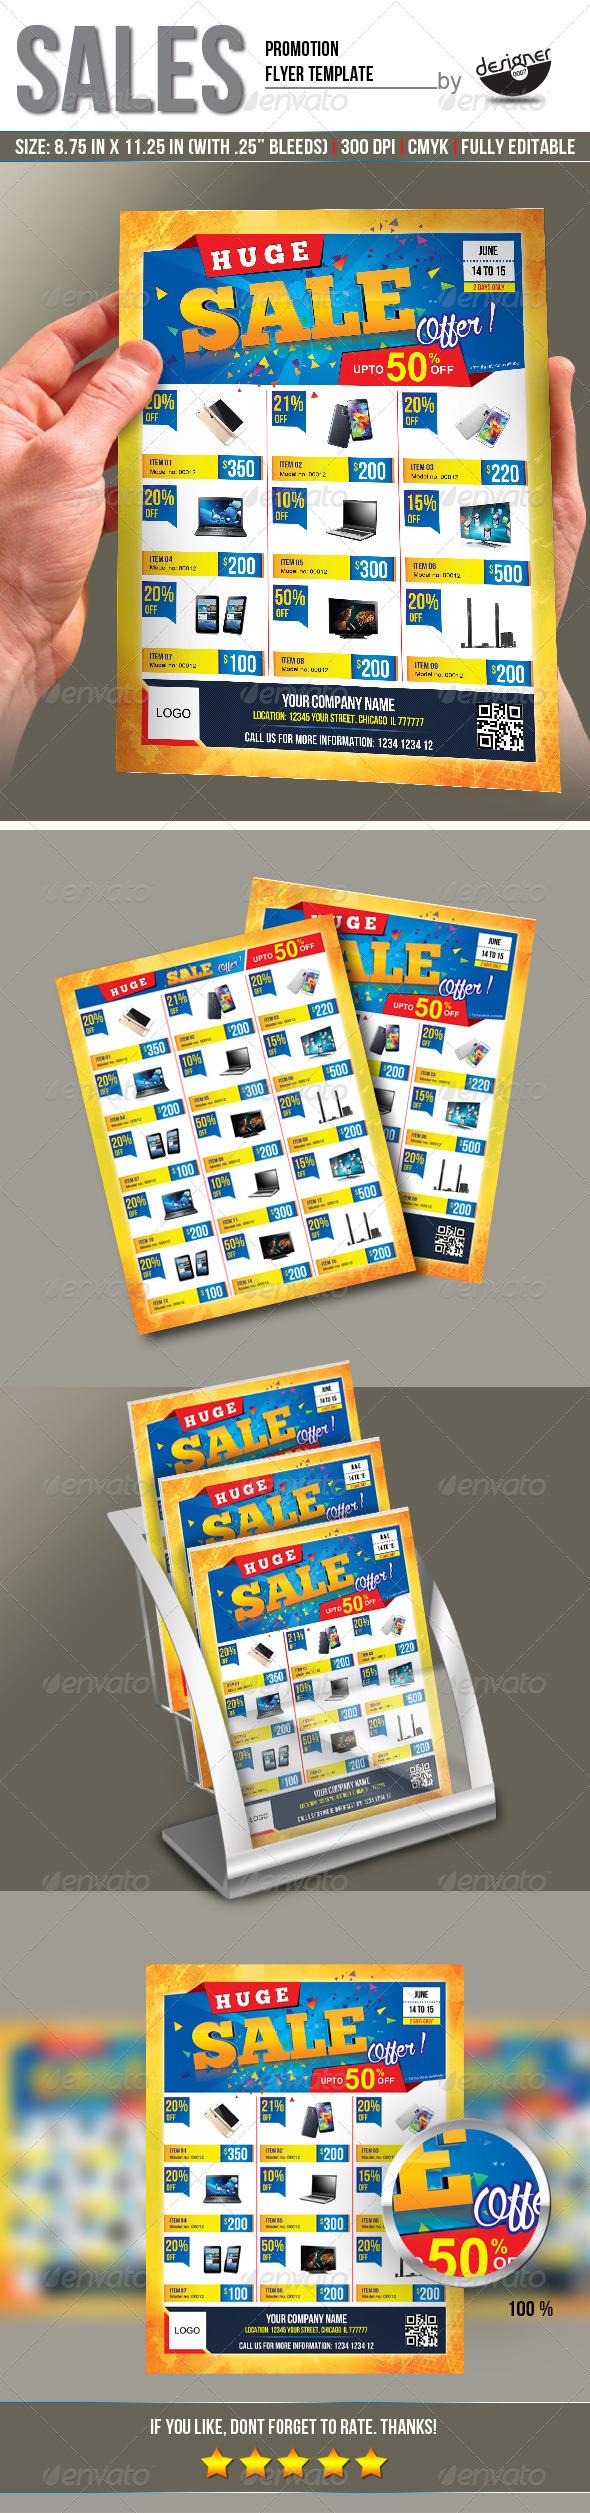 Sales Promotion Flyer Template by designer0007 GraphicRiver